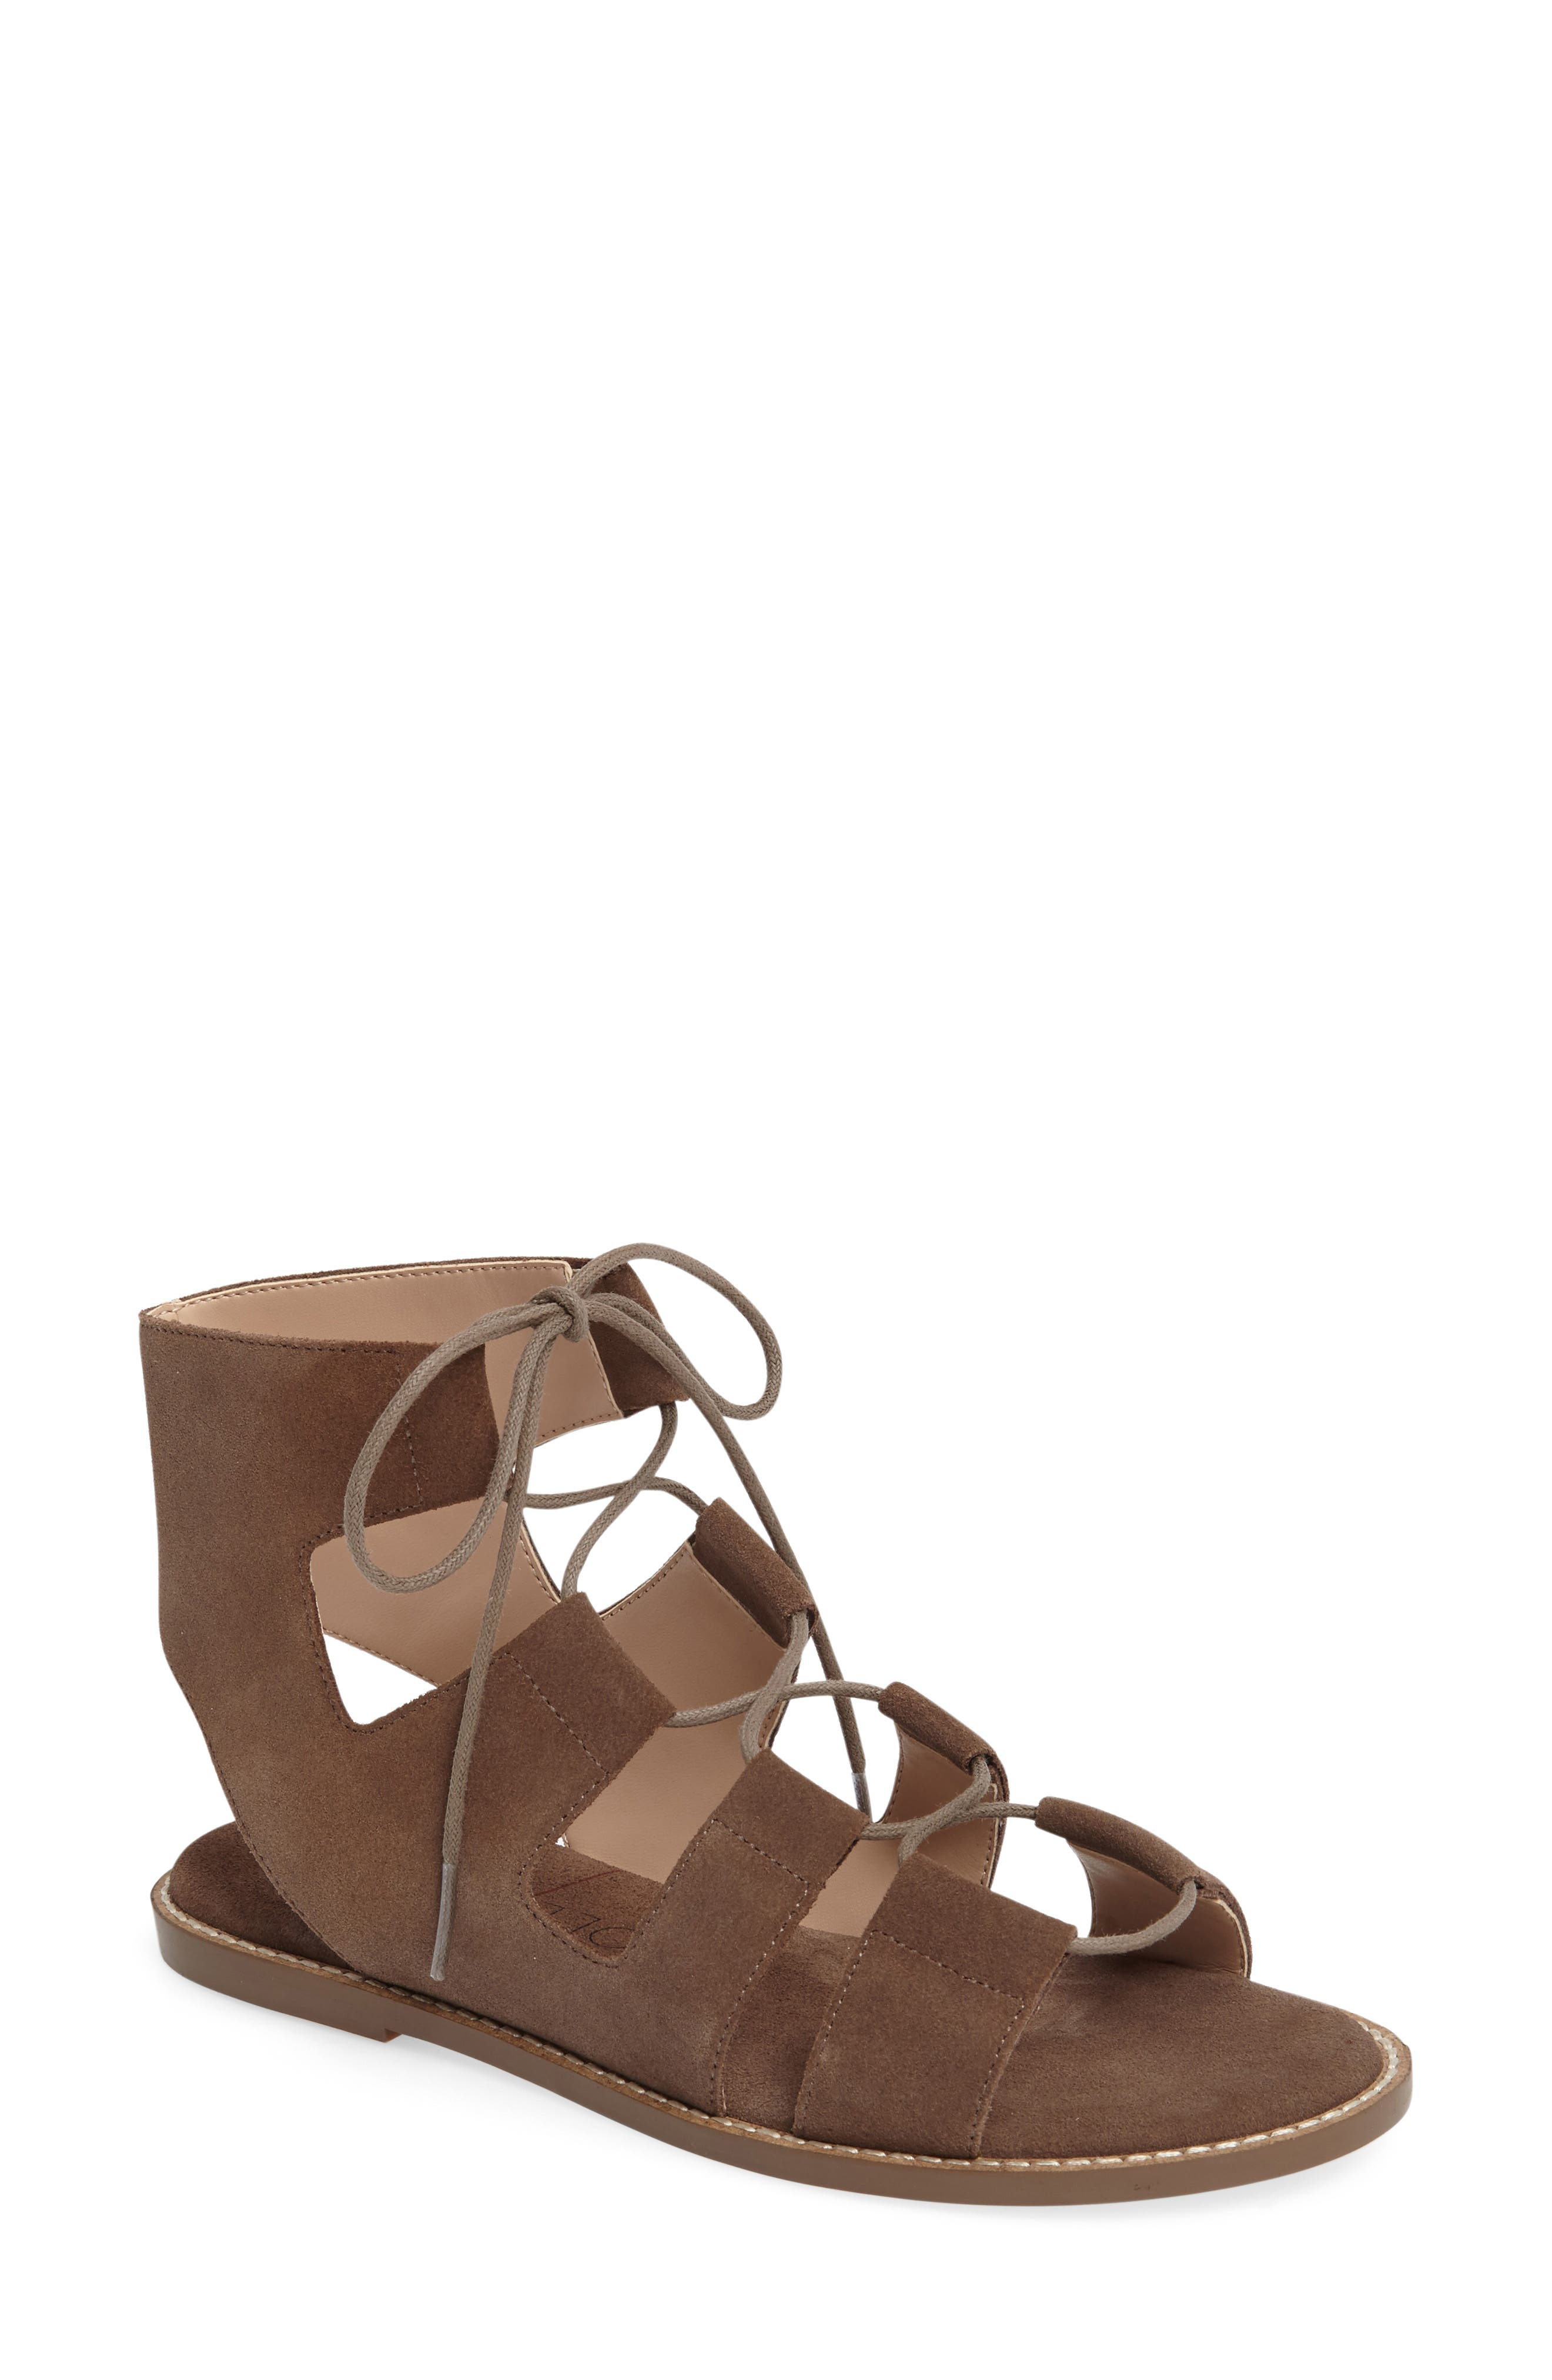 'Cady' Lace-Up Flat Sandal,                             Main thumbnail 1, color,